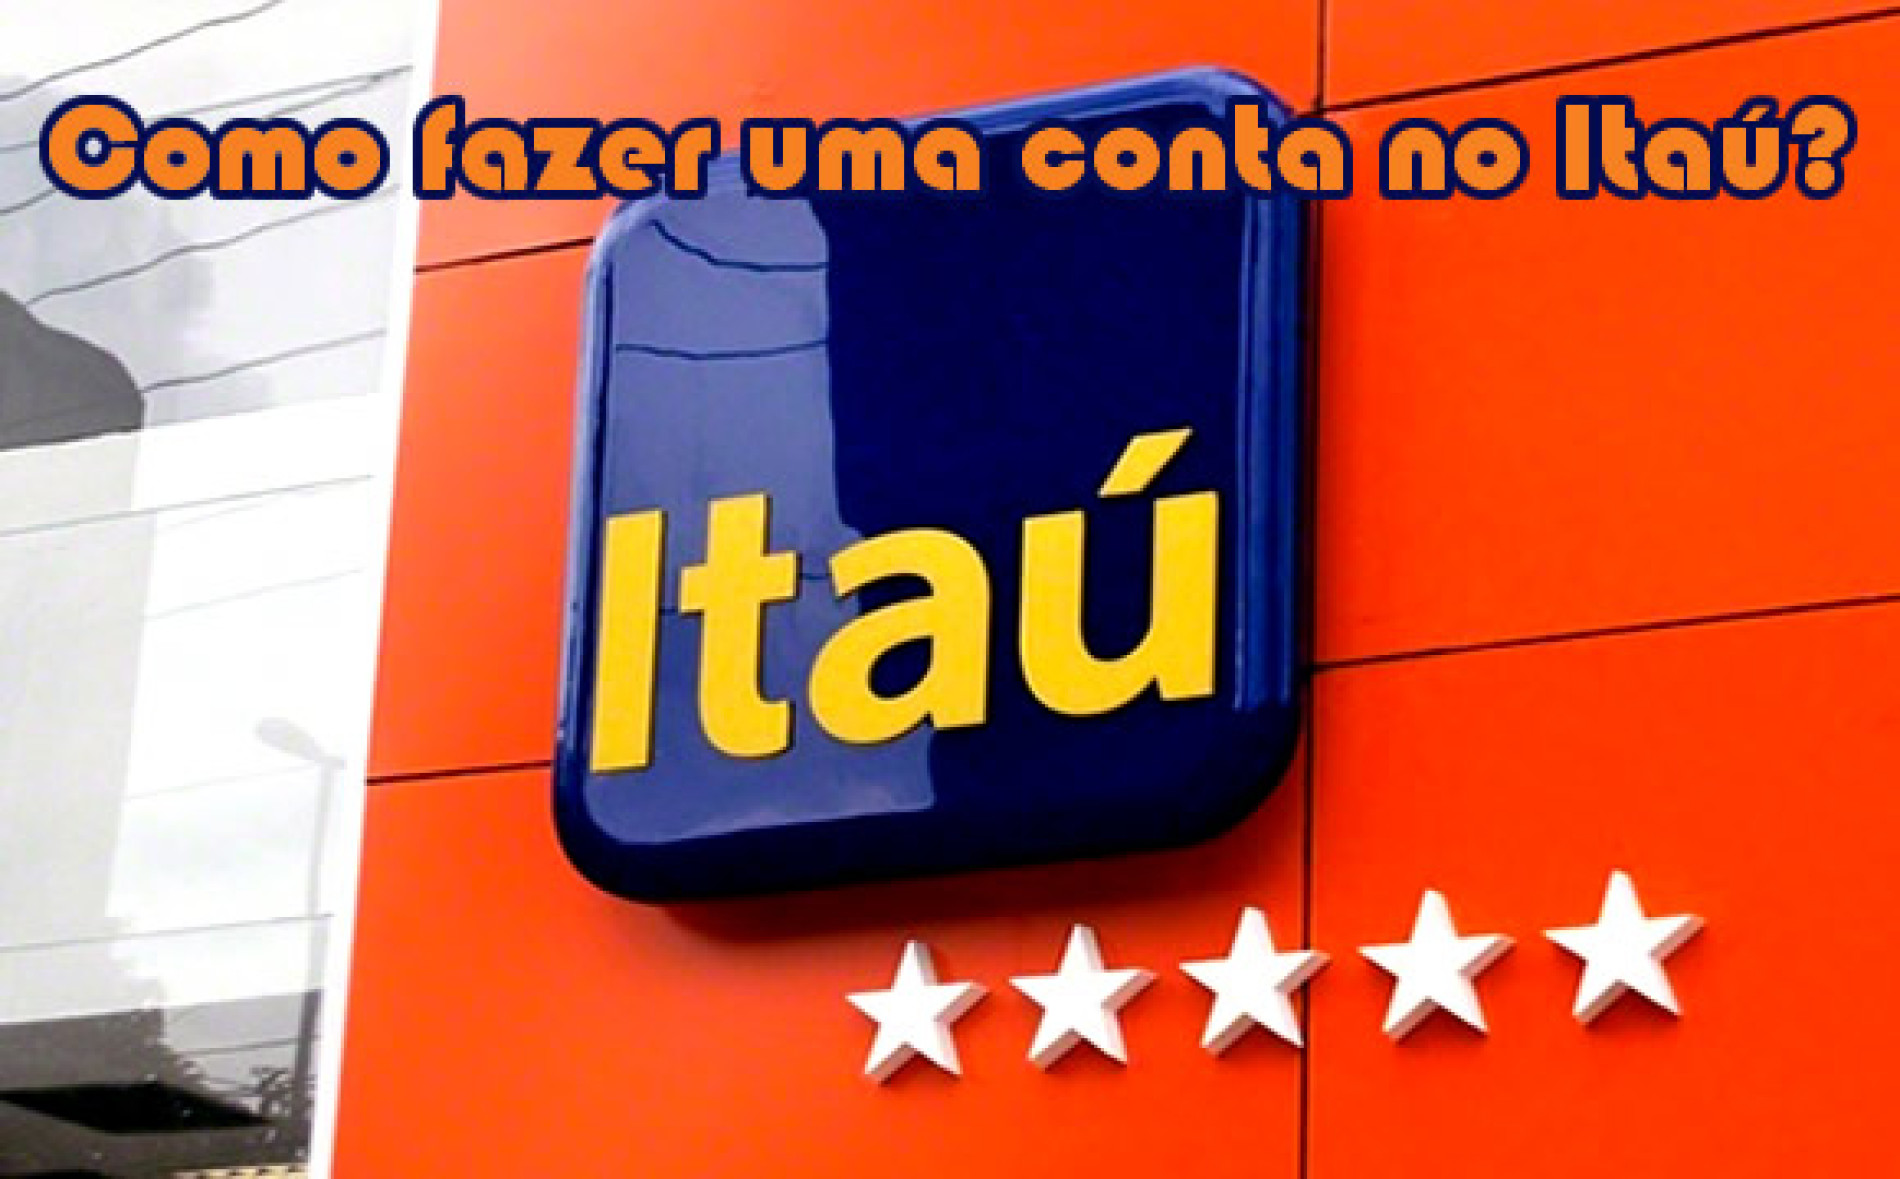 Como fazer conta no Itau – Abra conta no Banco Itaú